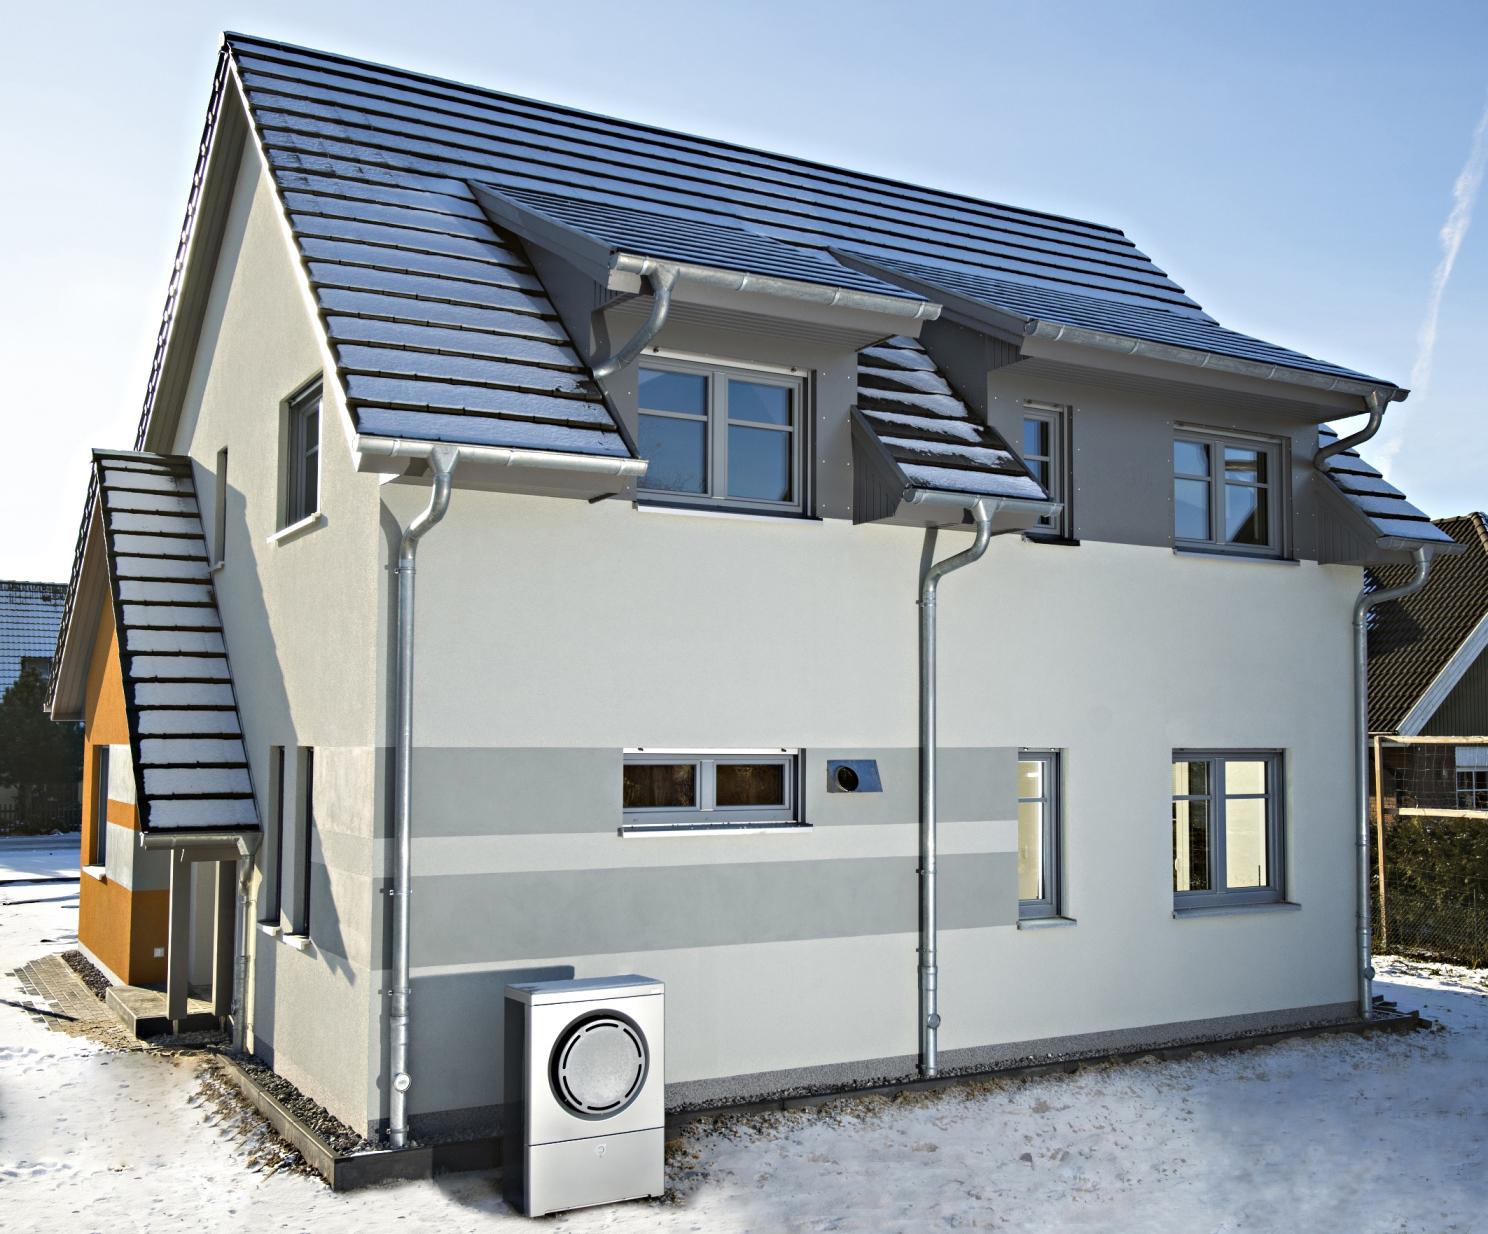 Casa M1 EnergyPlus - Casa M1 EnergyPlus - cea mai avansata constructie energetica din Germania